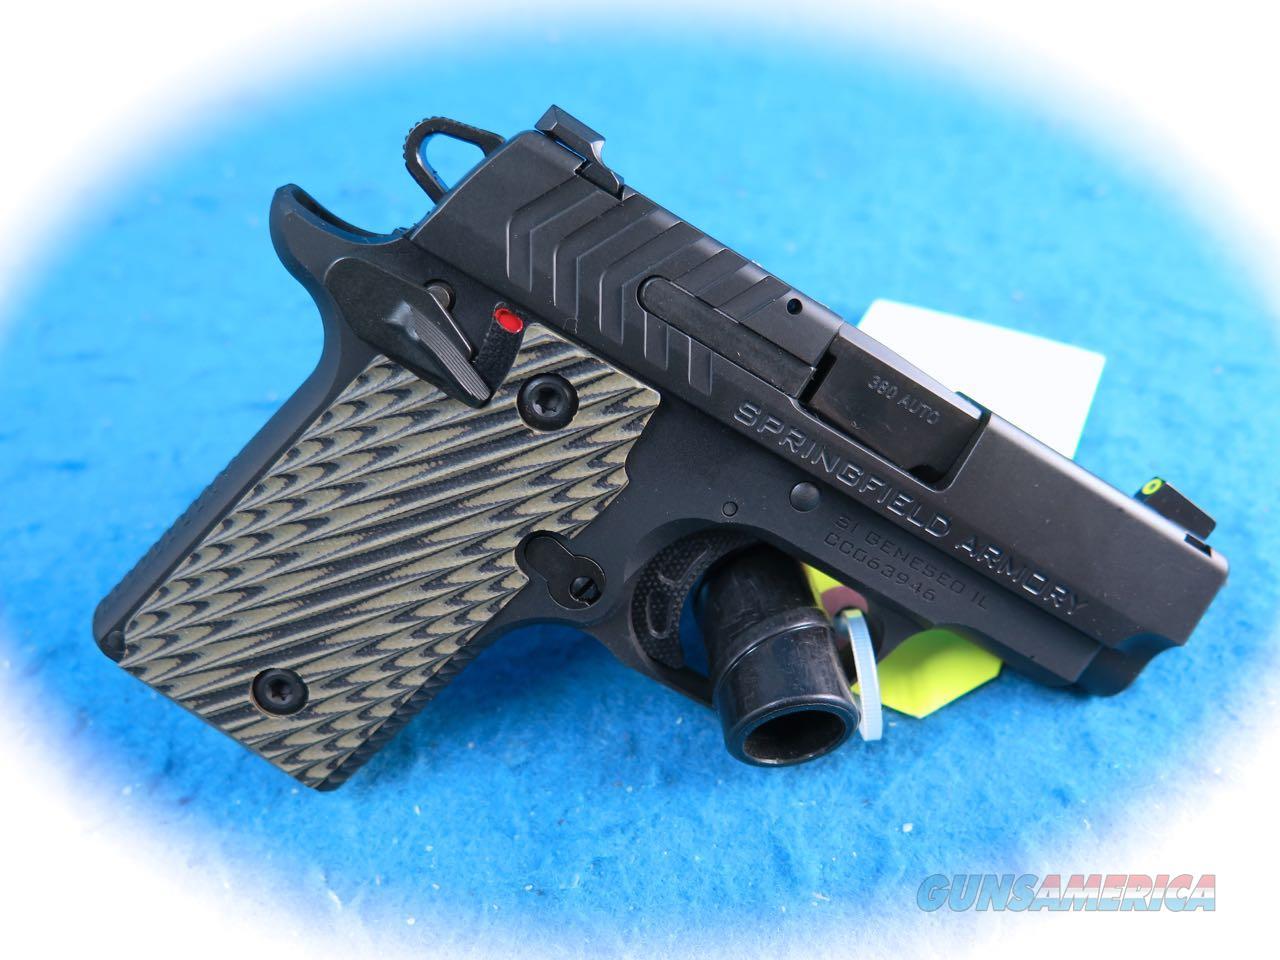 Springfield Armory 911 .380 ACP Pistol Model PG9109 **New**  Guns > Pistols > Springfield Armory Pistols > 911